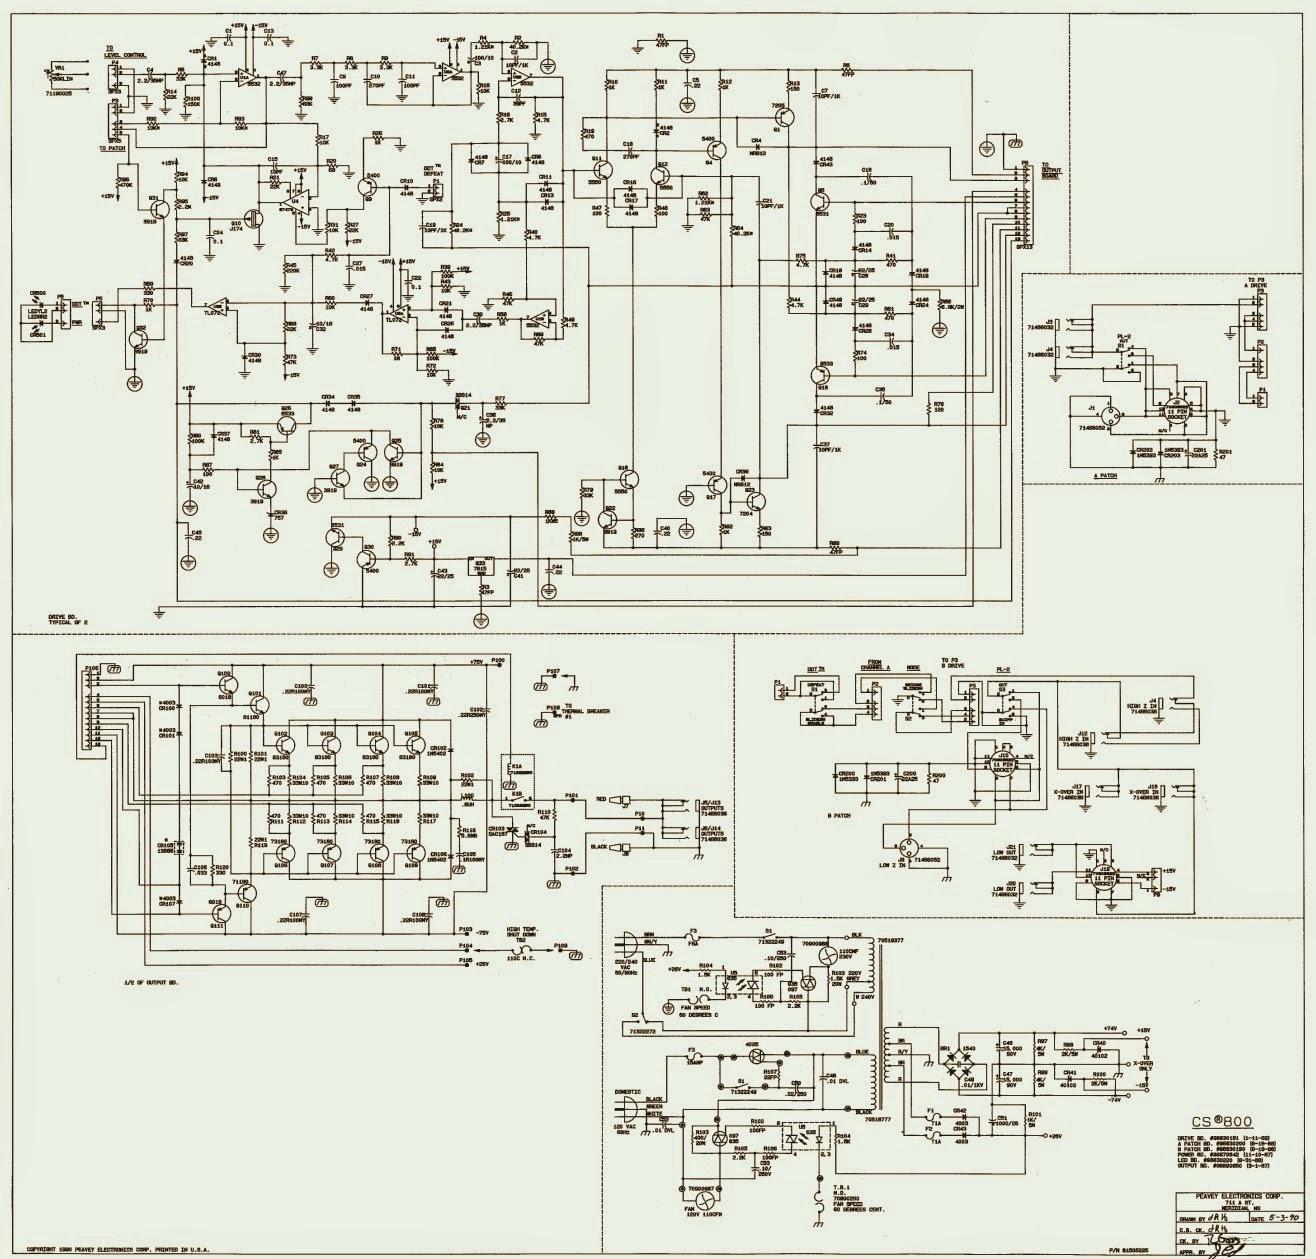 peavey cs 800 diagram schematic wiring diagrams u2022 gibson wiring diagrams peavey wiring diagrams [ 1316 x 1259 Pixel ]